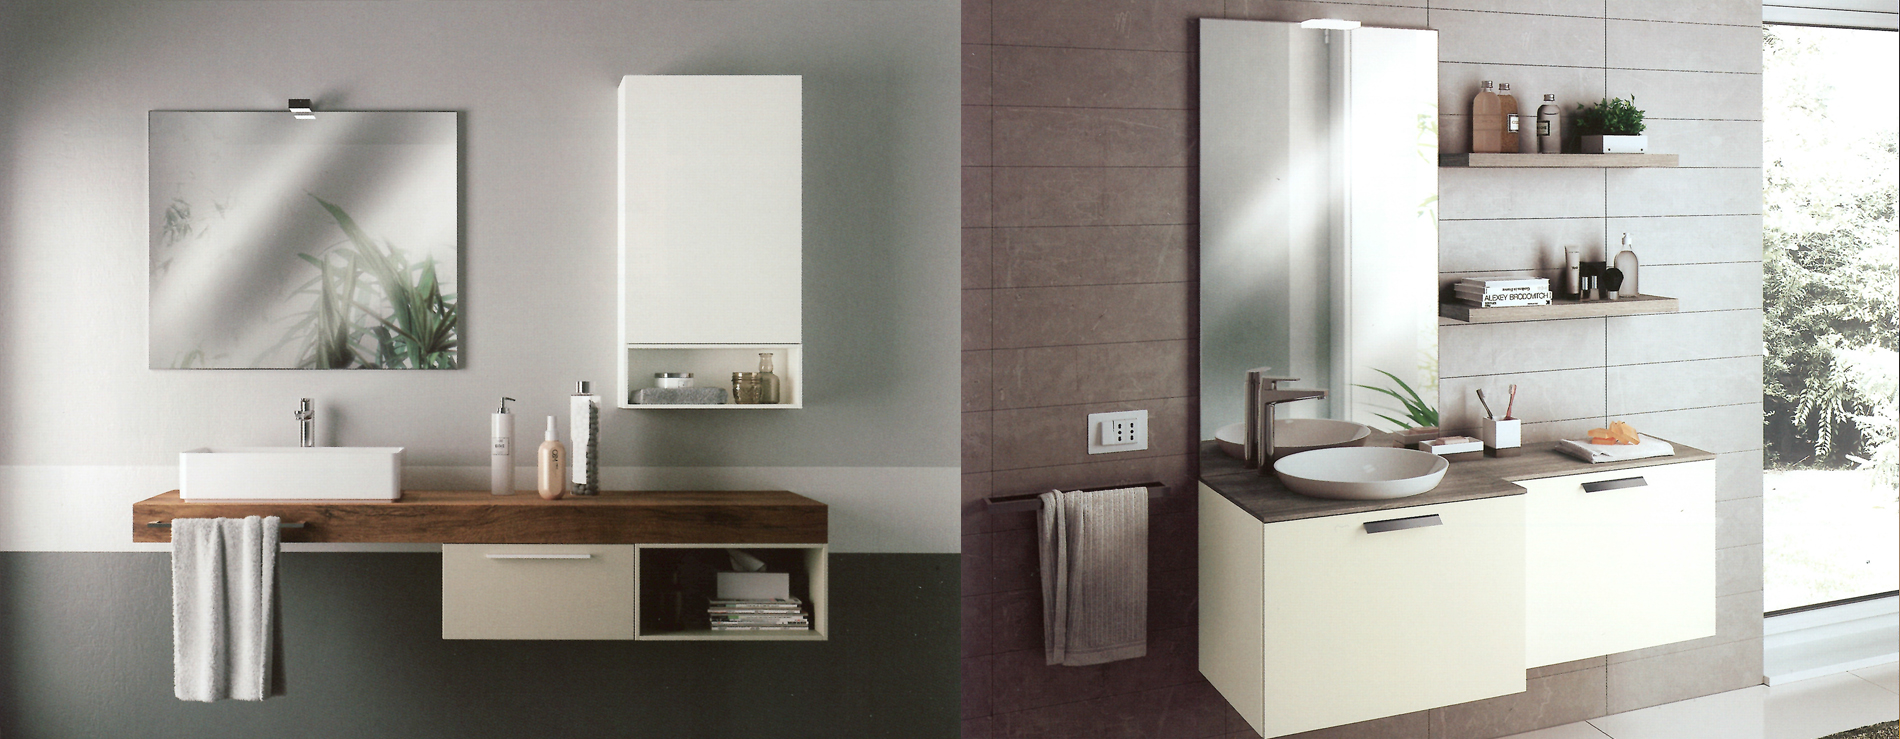 Mobili bagno piccoli spazi prfrence bagni moderni piccoli spazi bagni moderni piccoli spazi - Mobili bagno scavolini ...